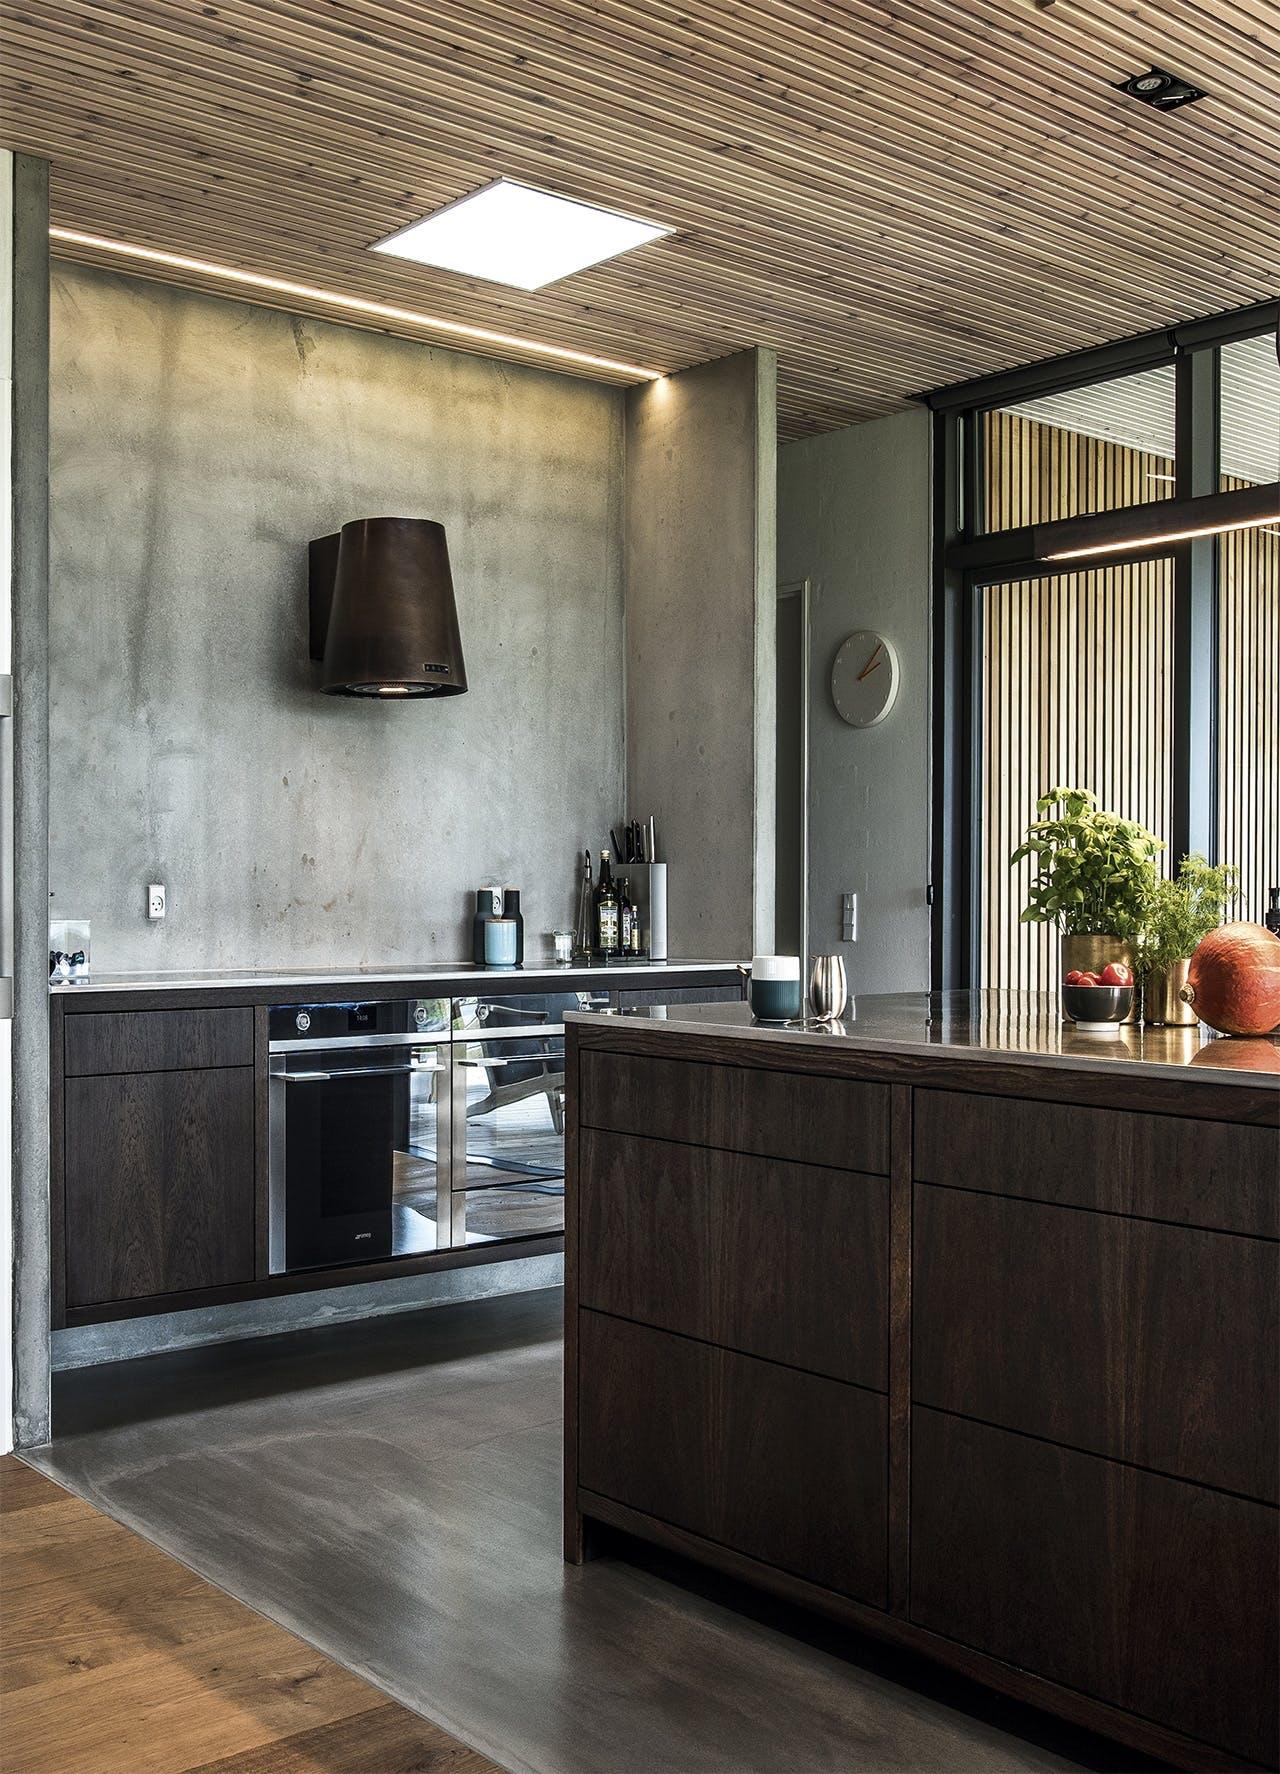 bolig boliger indretning arkitekttegnet huse køkken snedker køkken